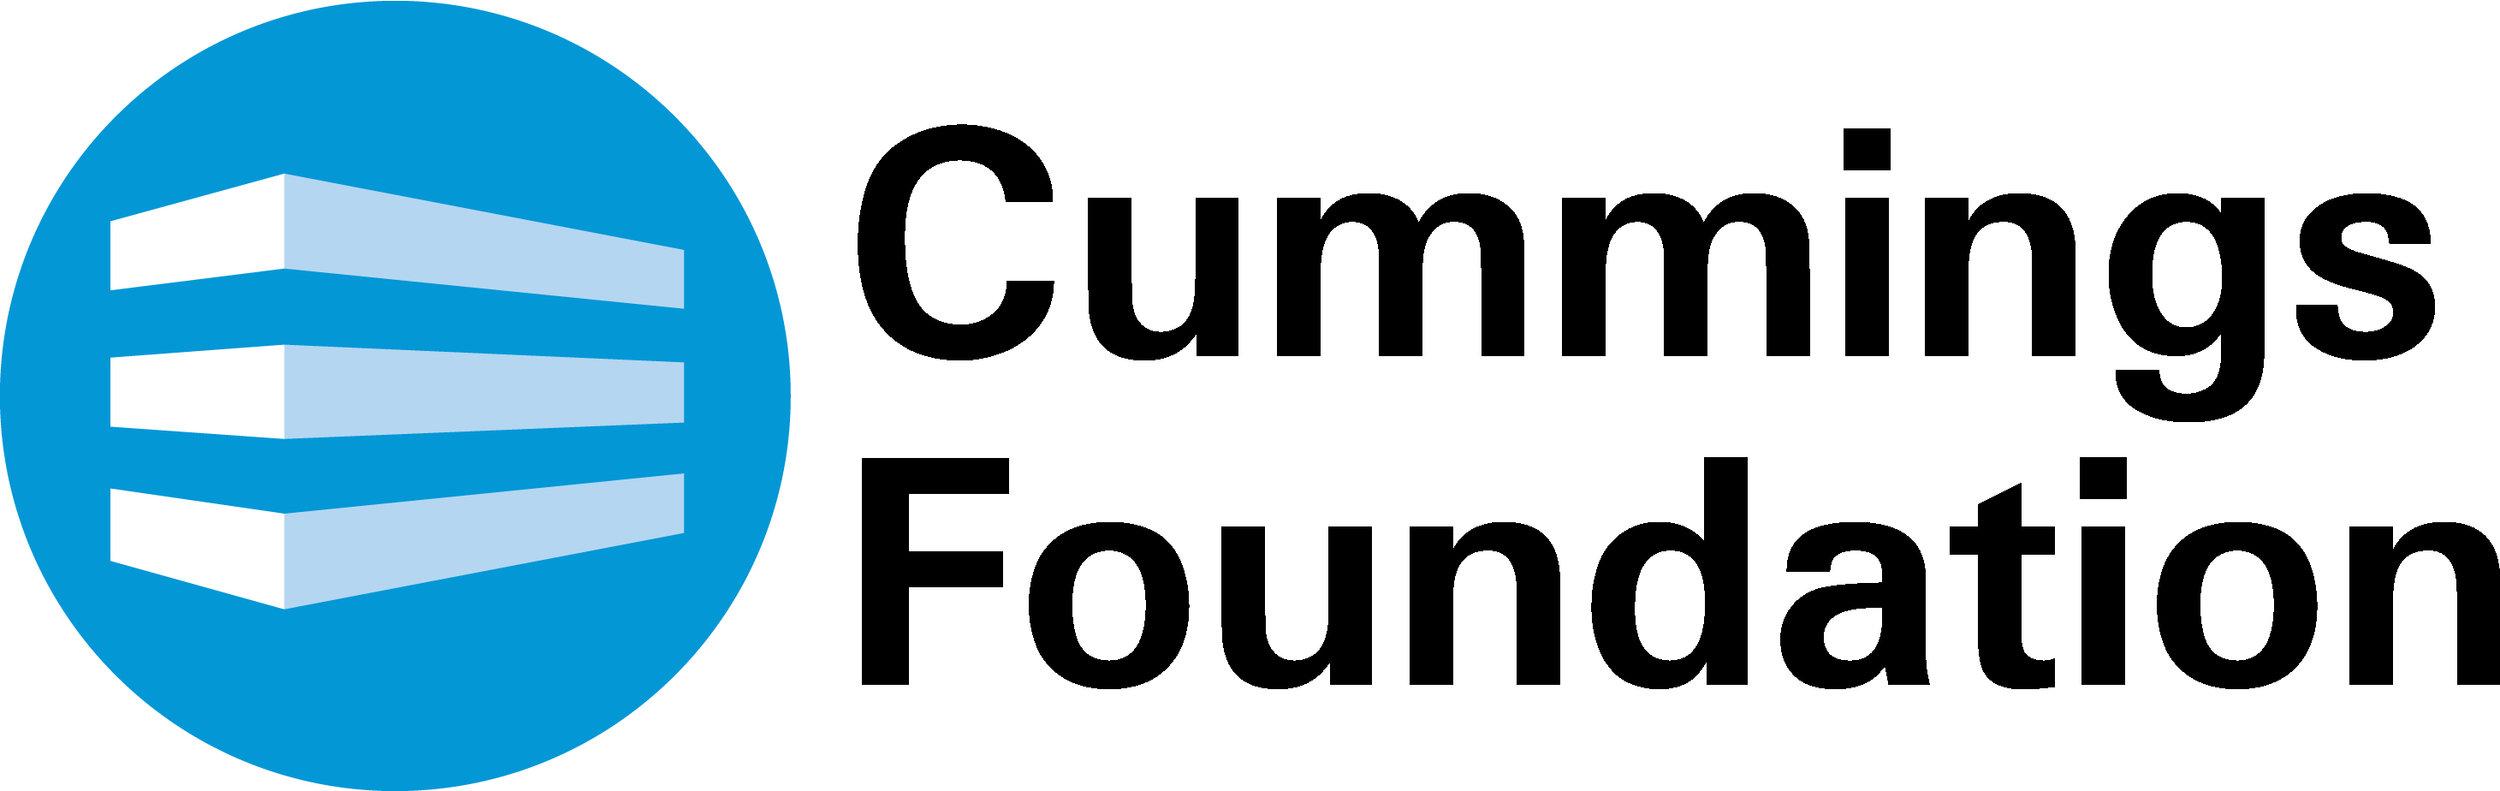 Cummings-Foundation-logo.jpg